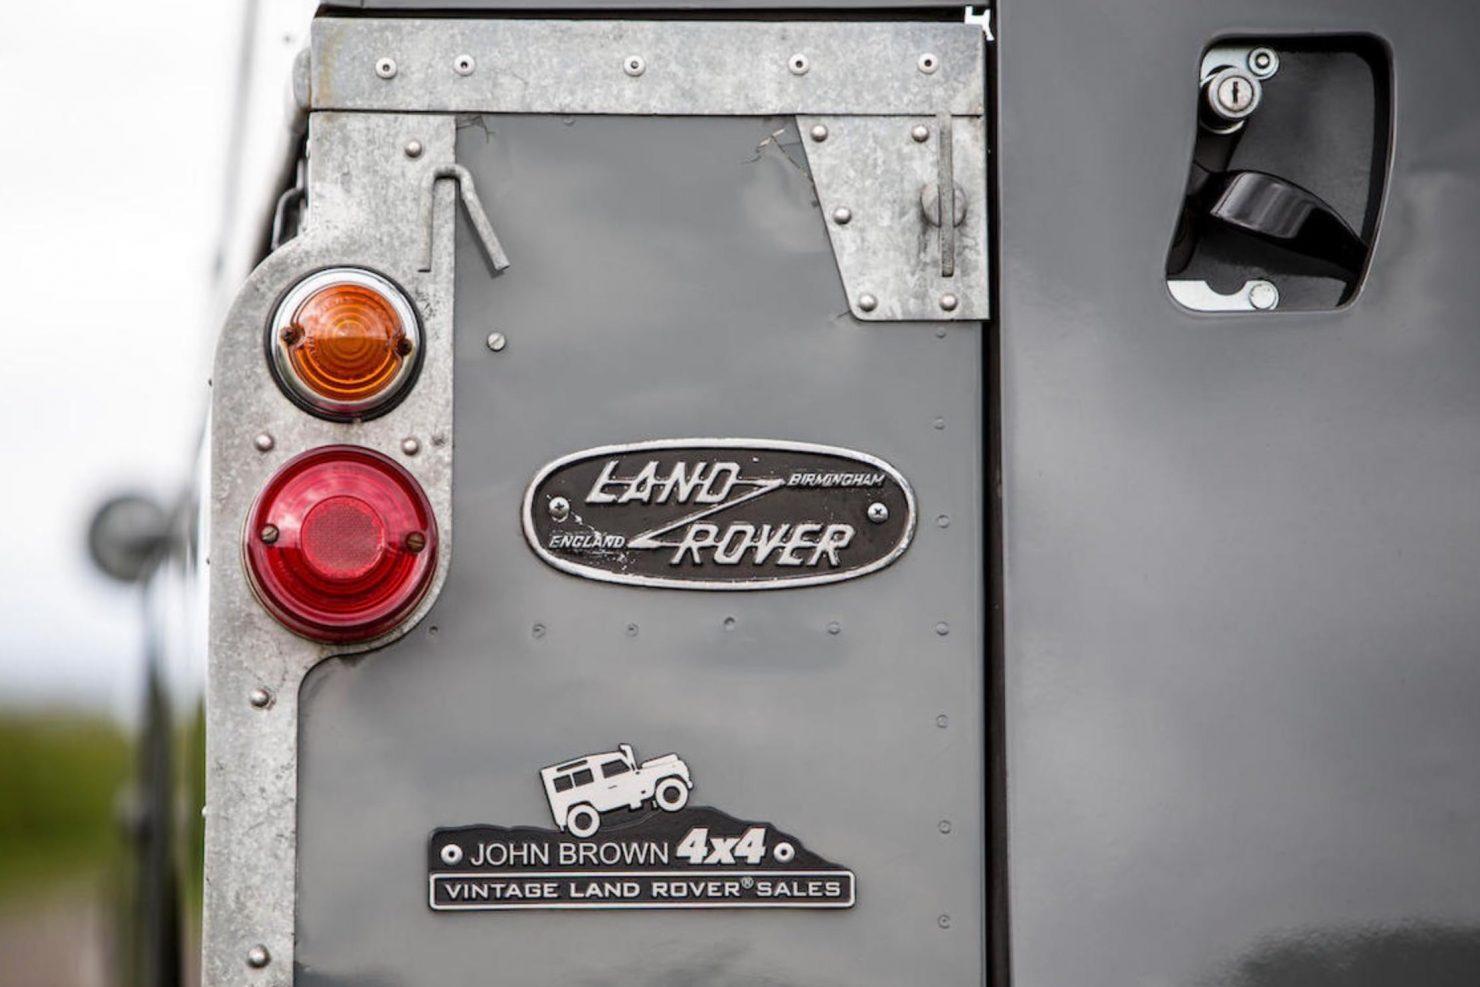 land rover Cuthbertson 3 1480x987